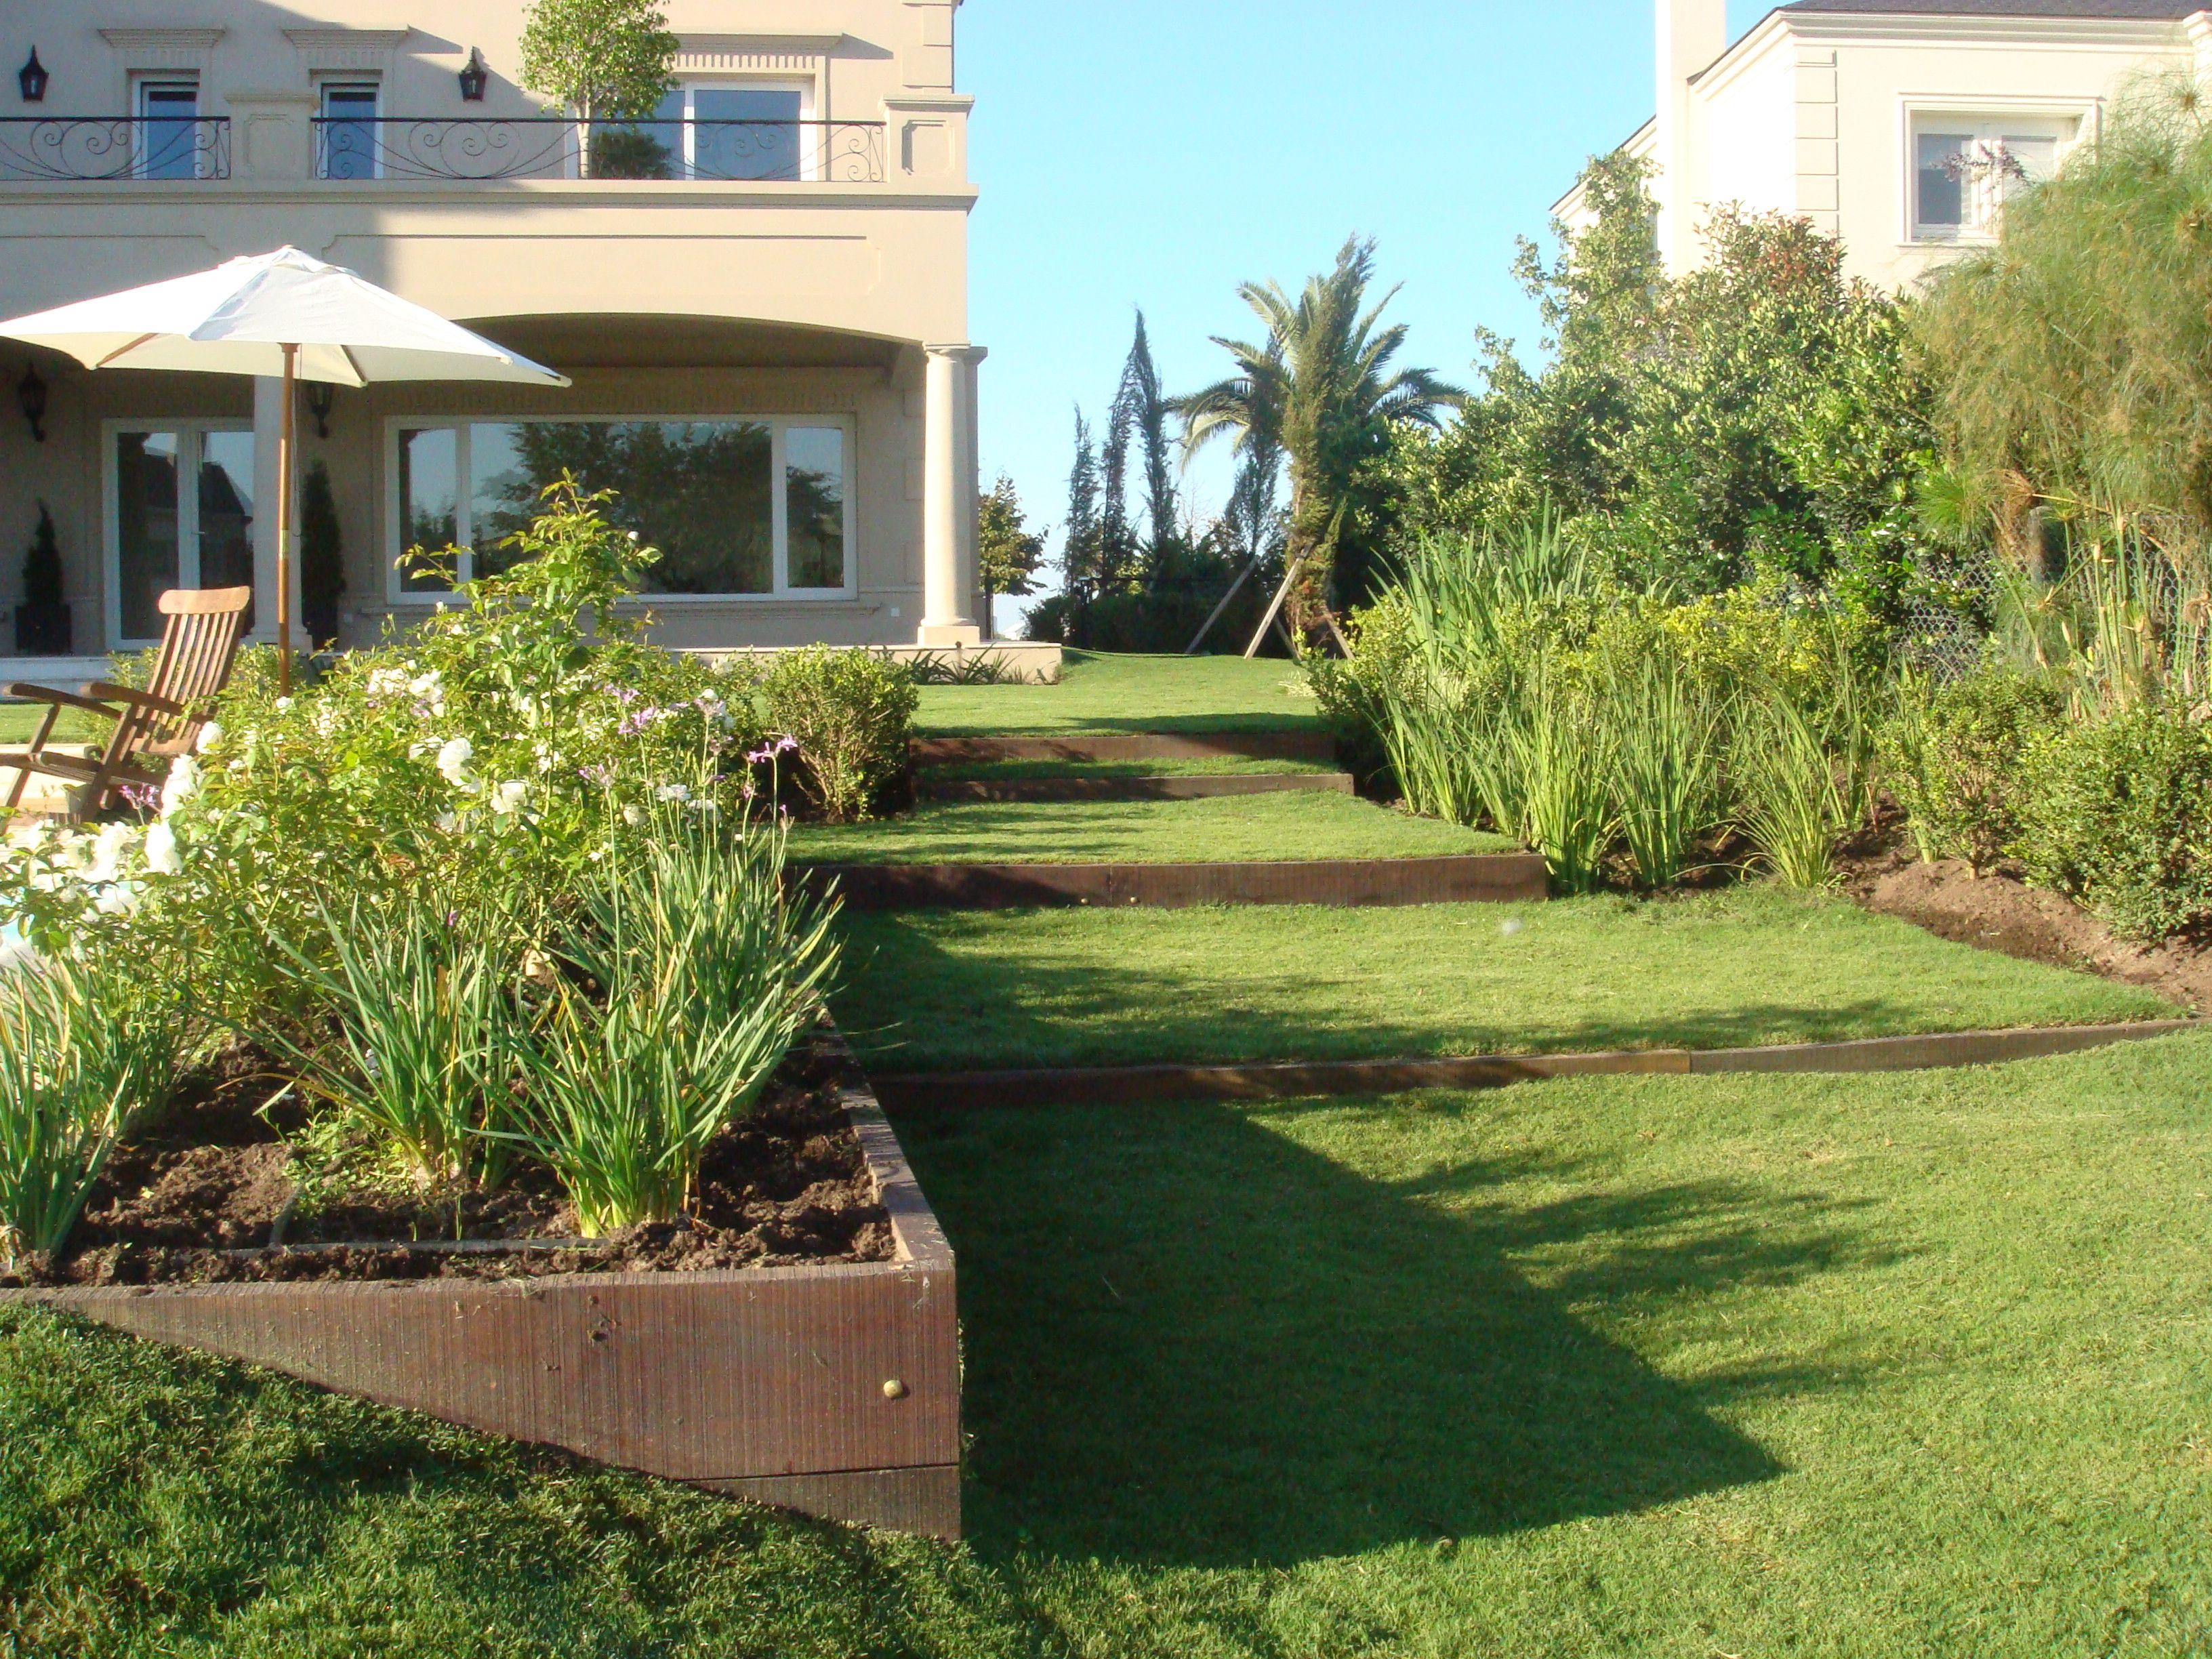 Mas madera y desniveles en un jardin piletas pinterest for Jardines en desnivel